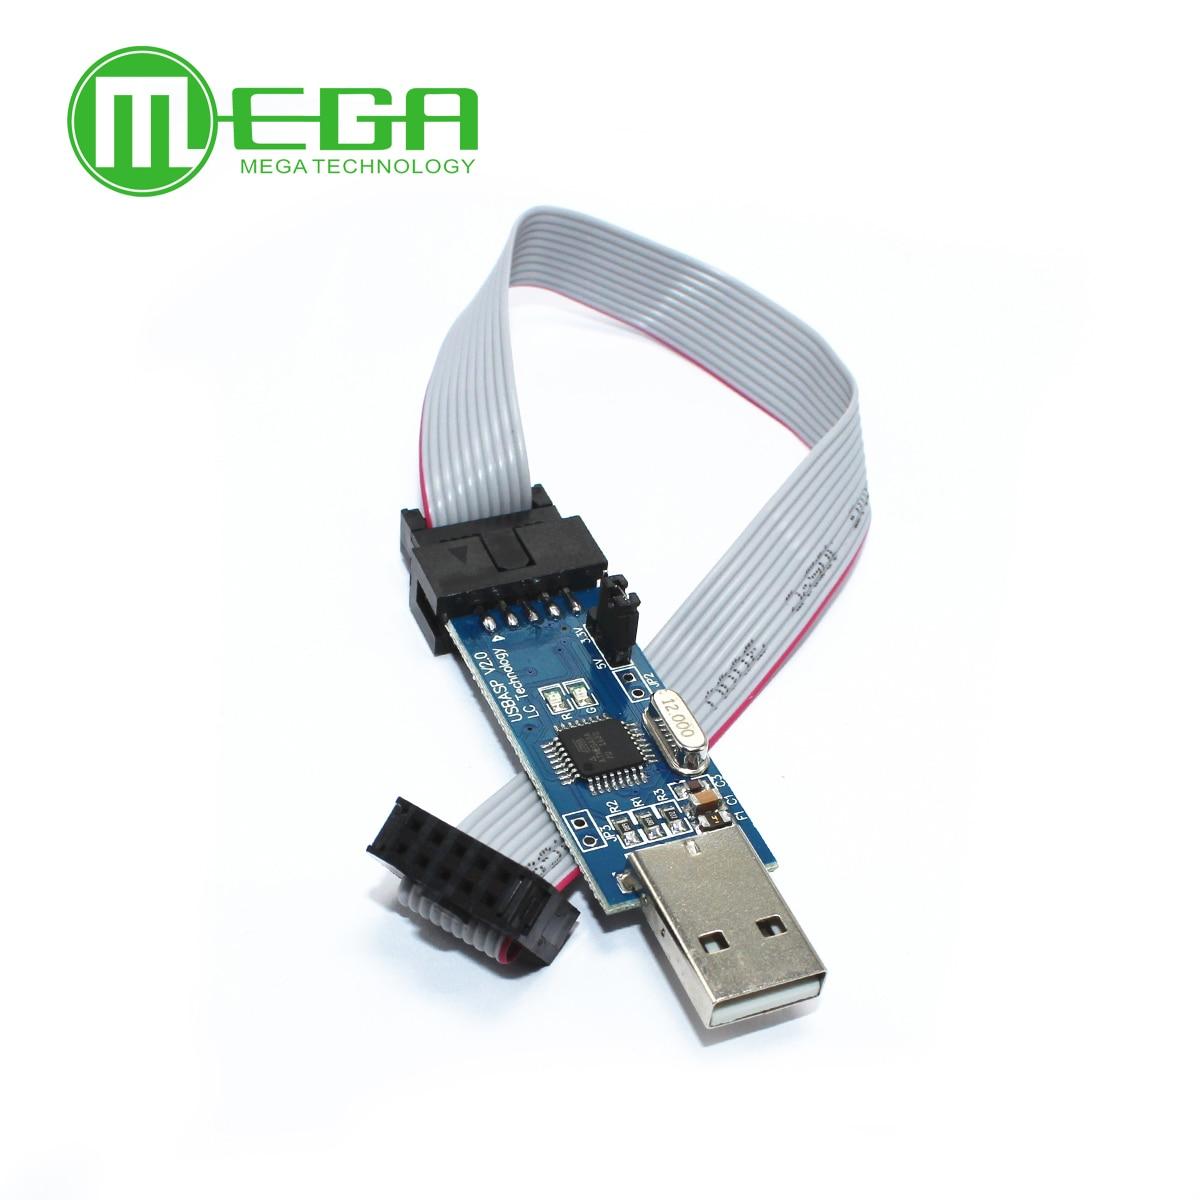 B202 1 шт. Новый USBASP USBISP AVR программист USB ISP USB ASP ATMEGA8 ATMEGA128 Поддержка Win7 64 К ...